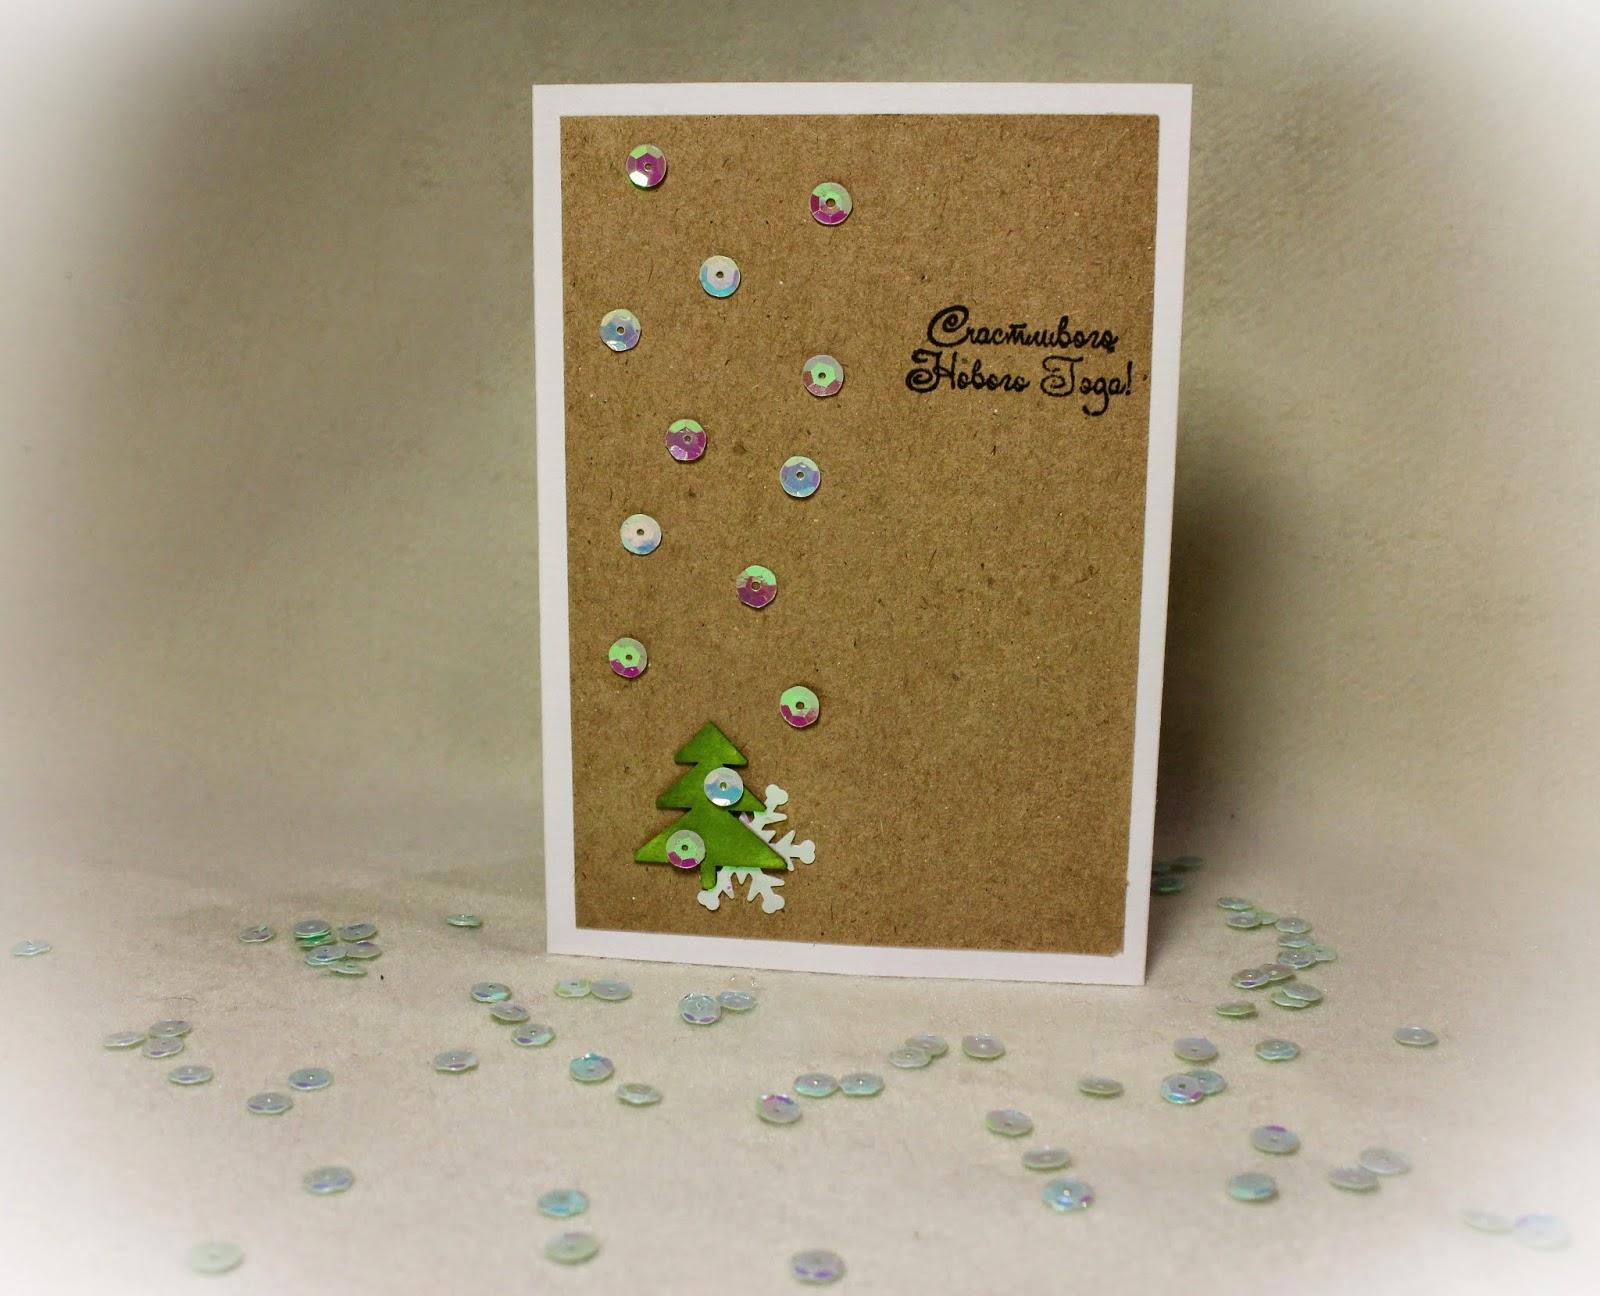 new year card scrapbooking скрапбукинг открытка новый год